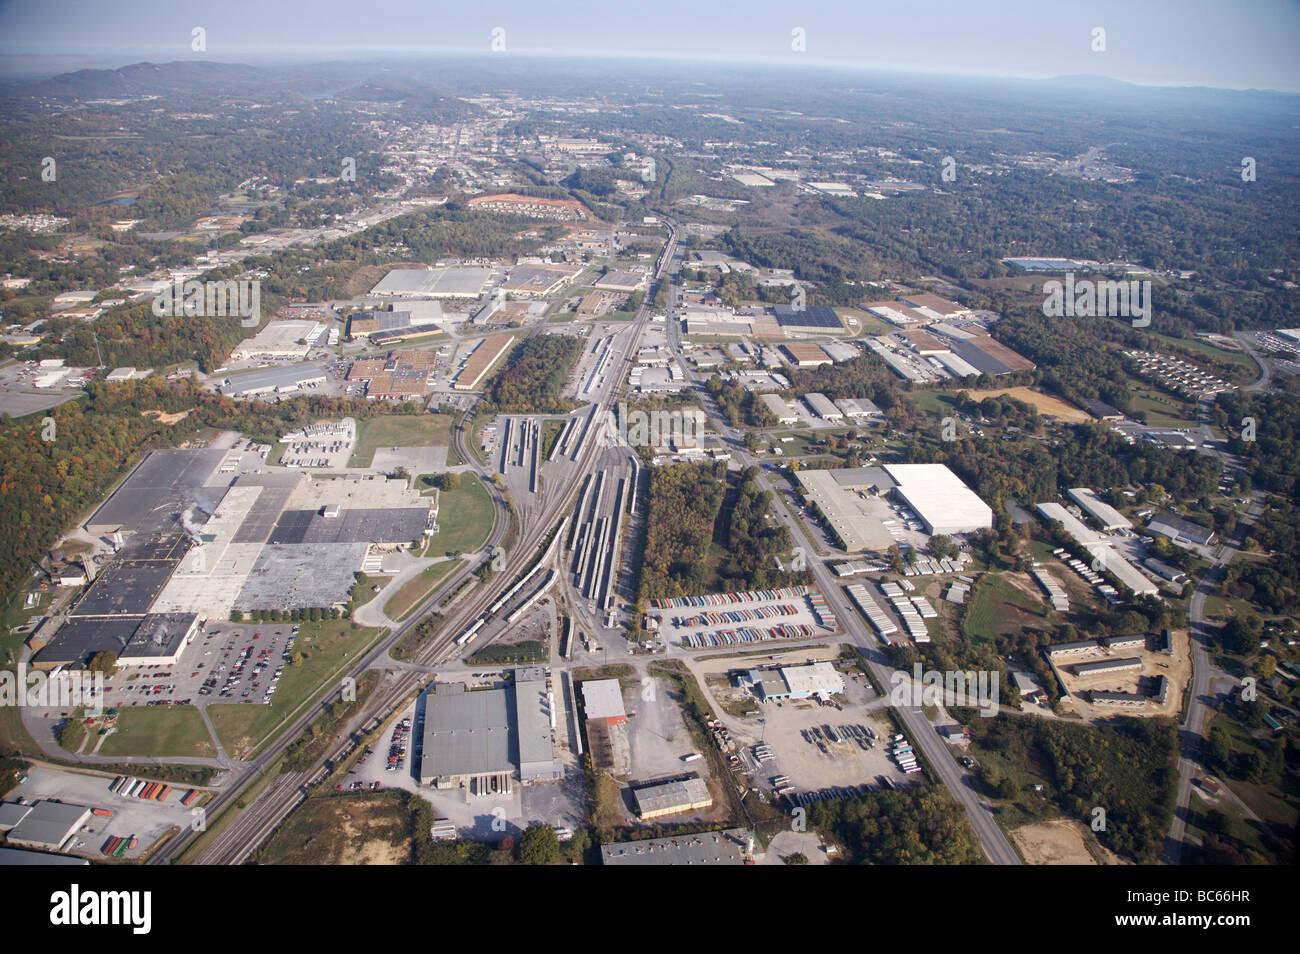 Aerial View of the city of Dalton Georgia Stock Photo